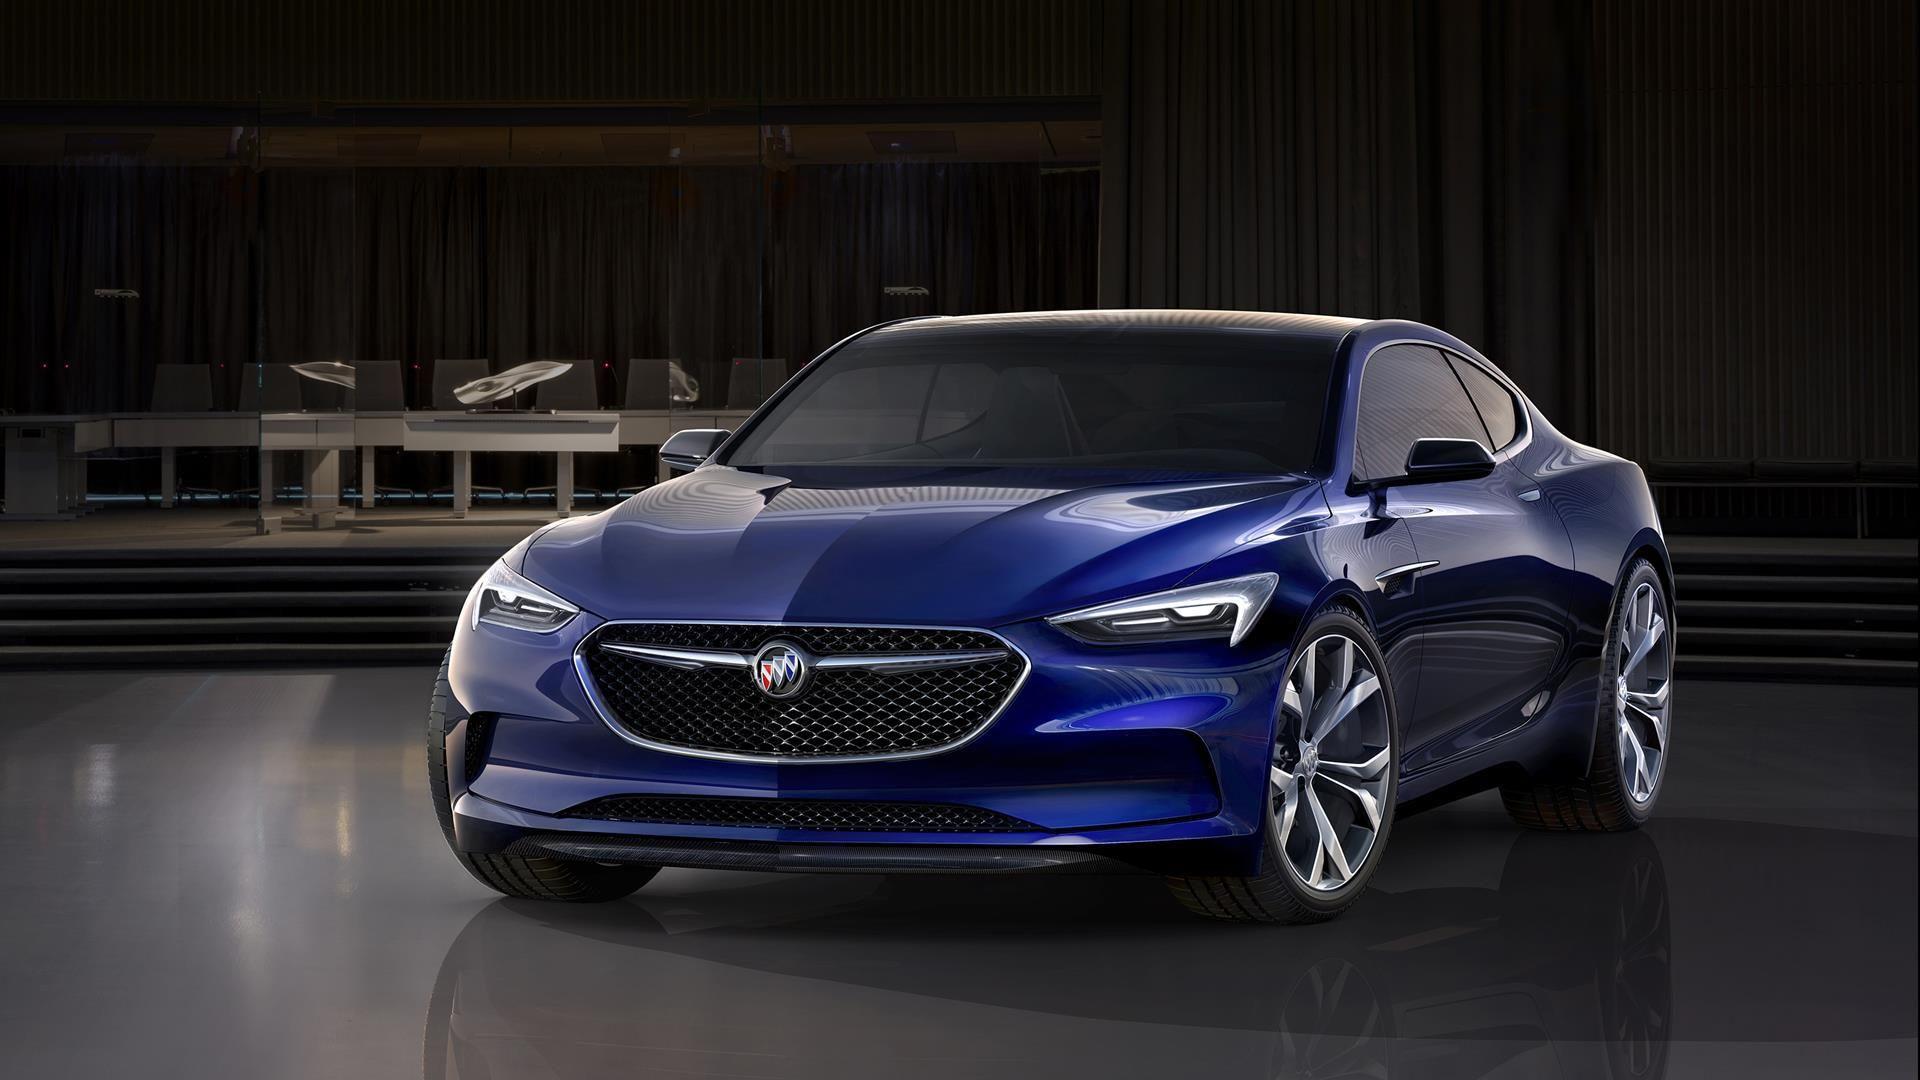 2020 Buick Avista Concept, Price, MSRP and Release Date - Car Rumor | Buick | Buick avenir ...